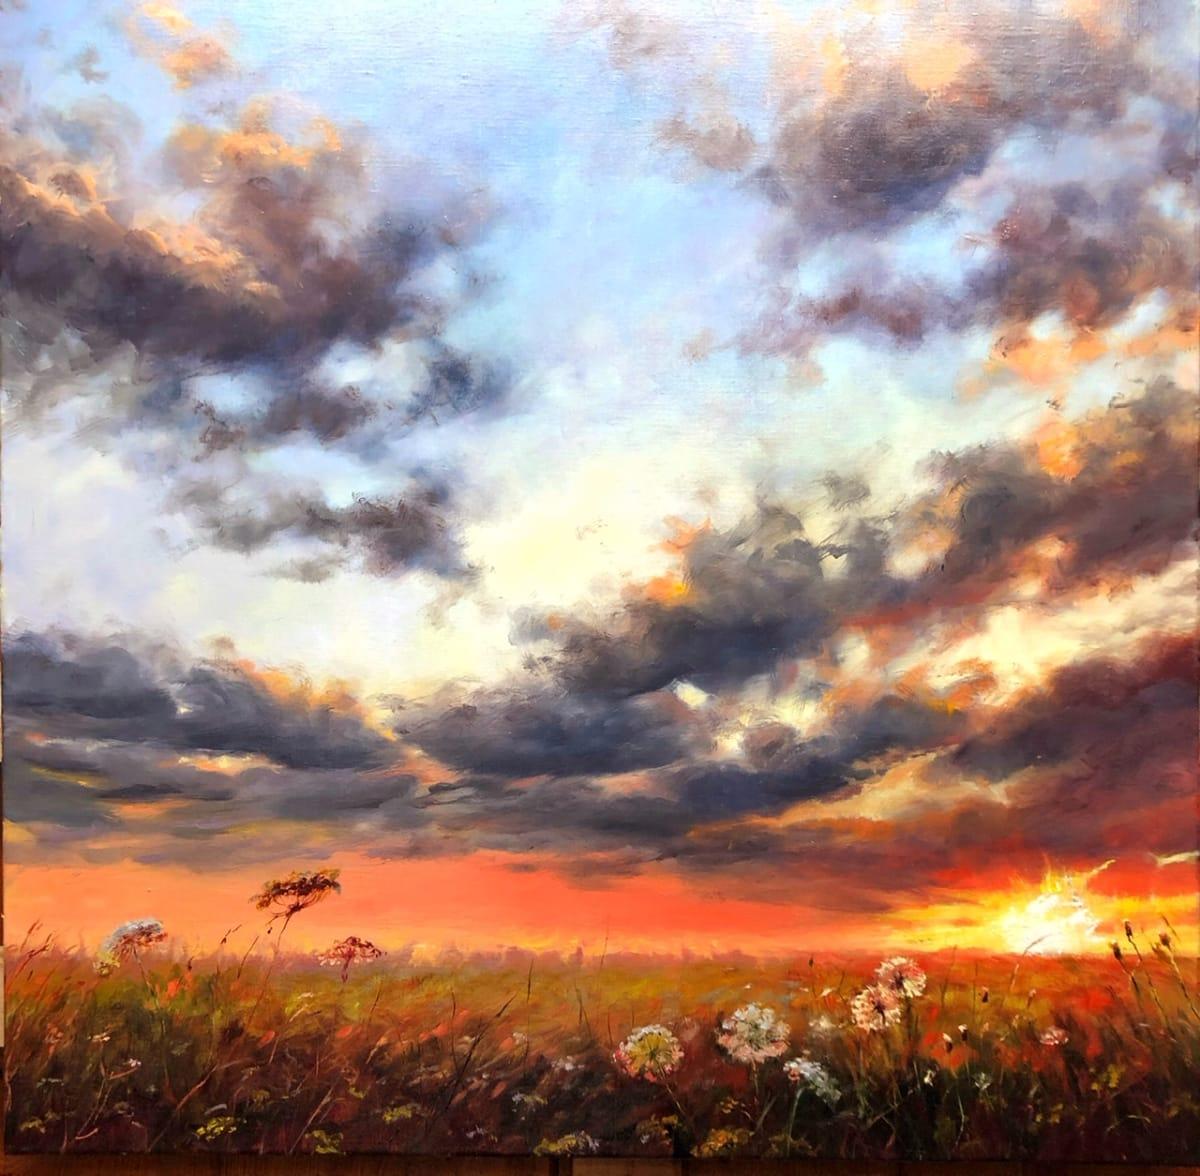 The Majesty of Sunlight by Deana Evstefeeva